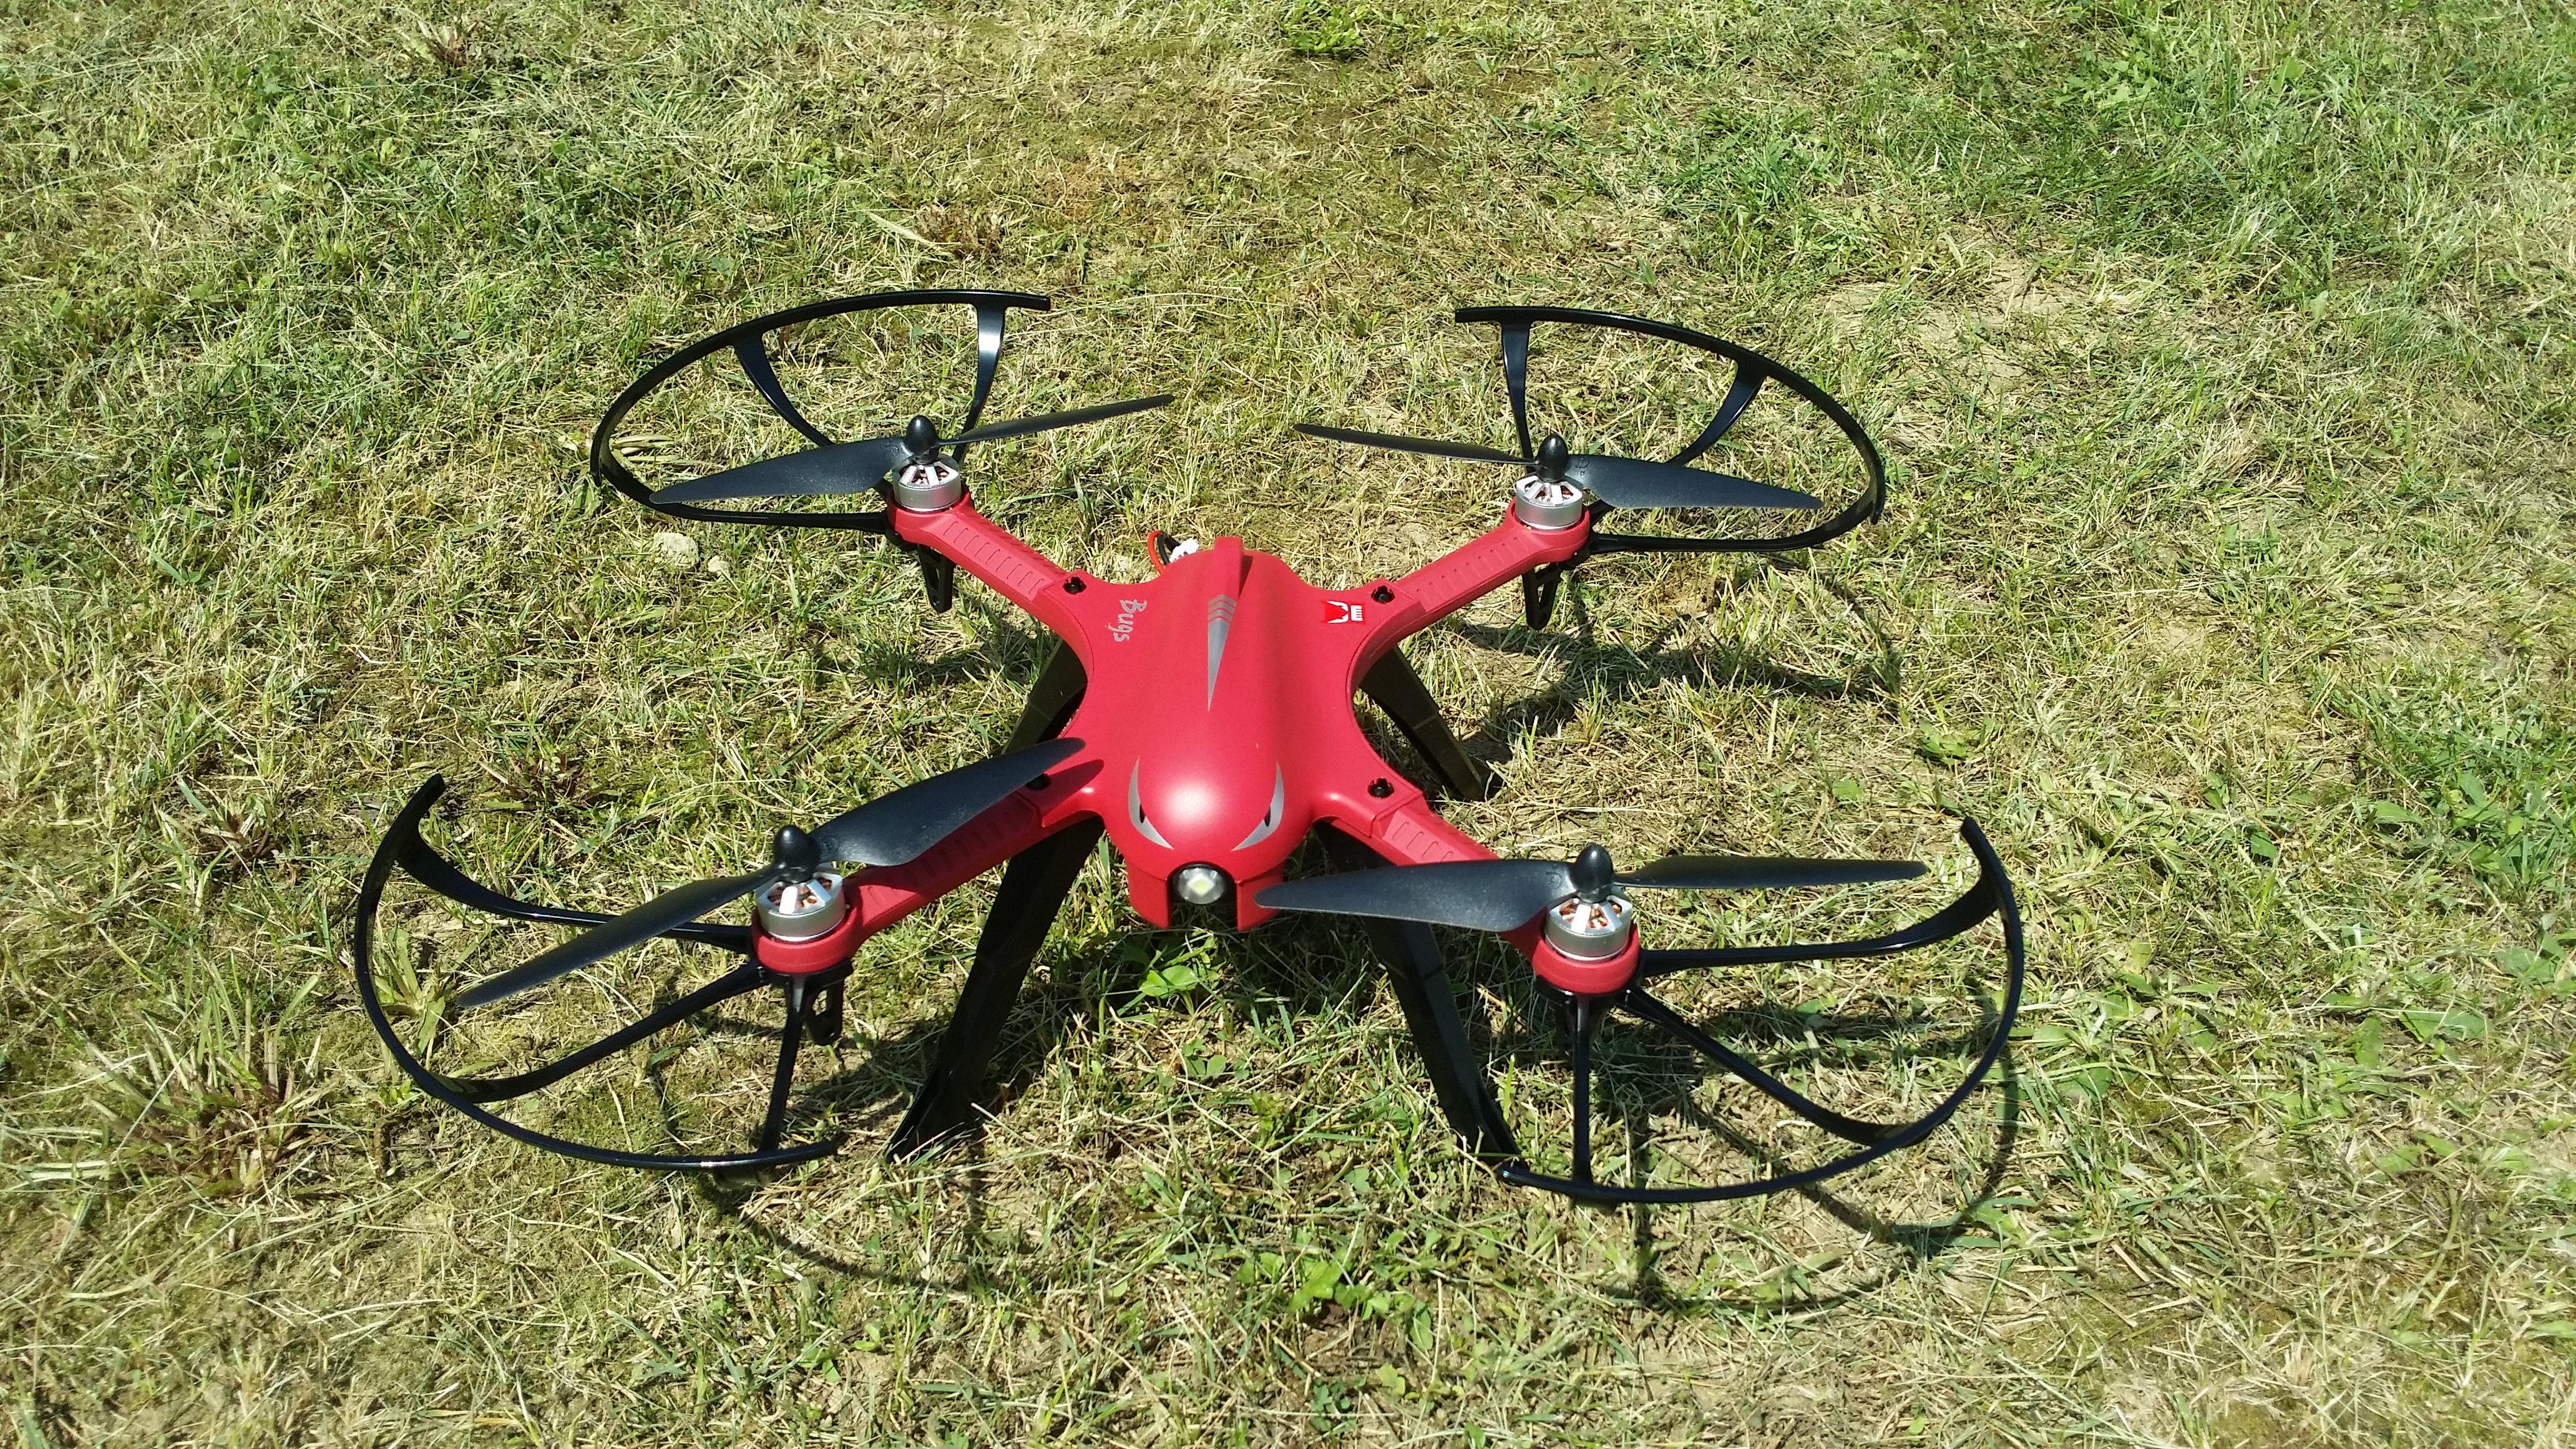 mjx-bugs-3-dron-teszt-20180804_132527.jpg